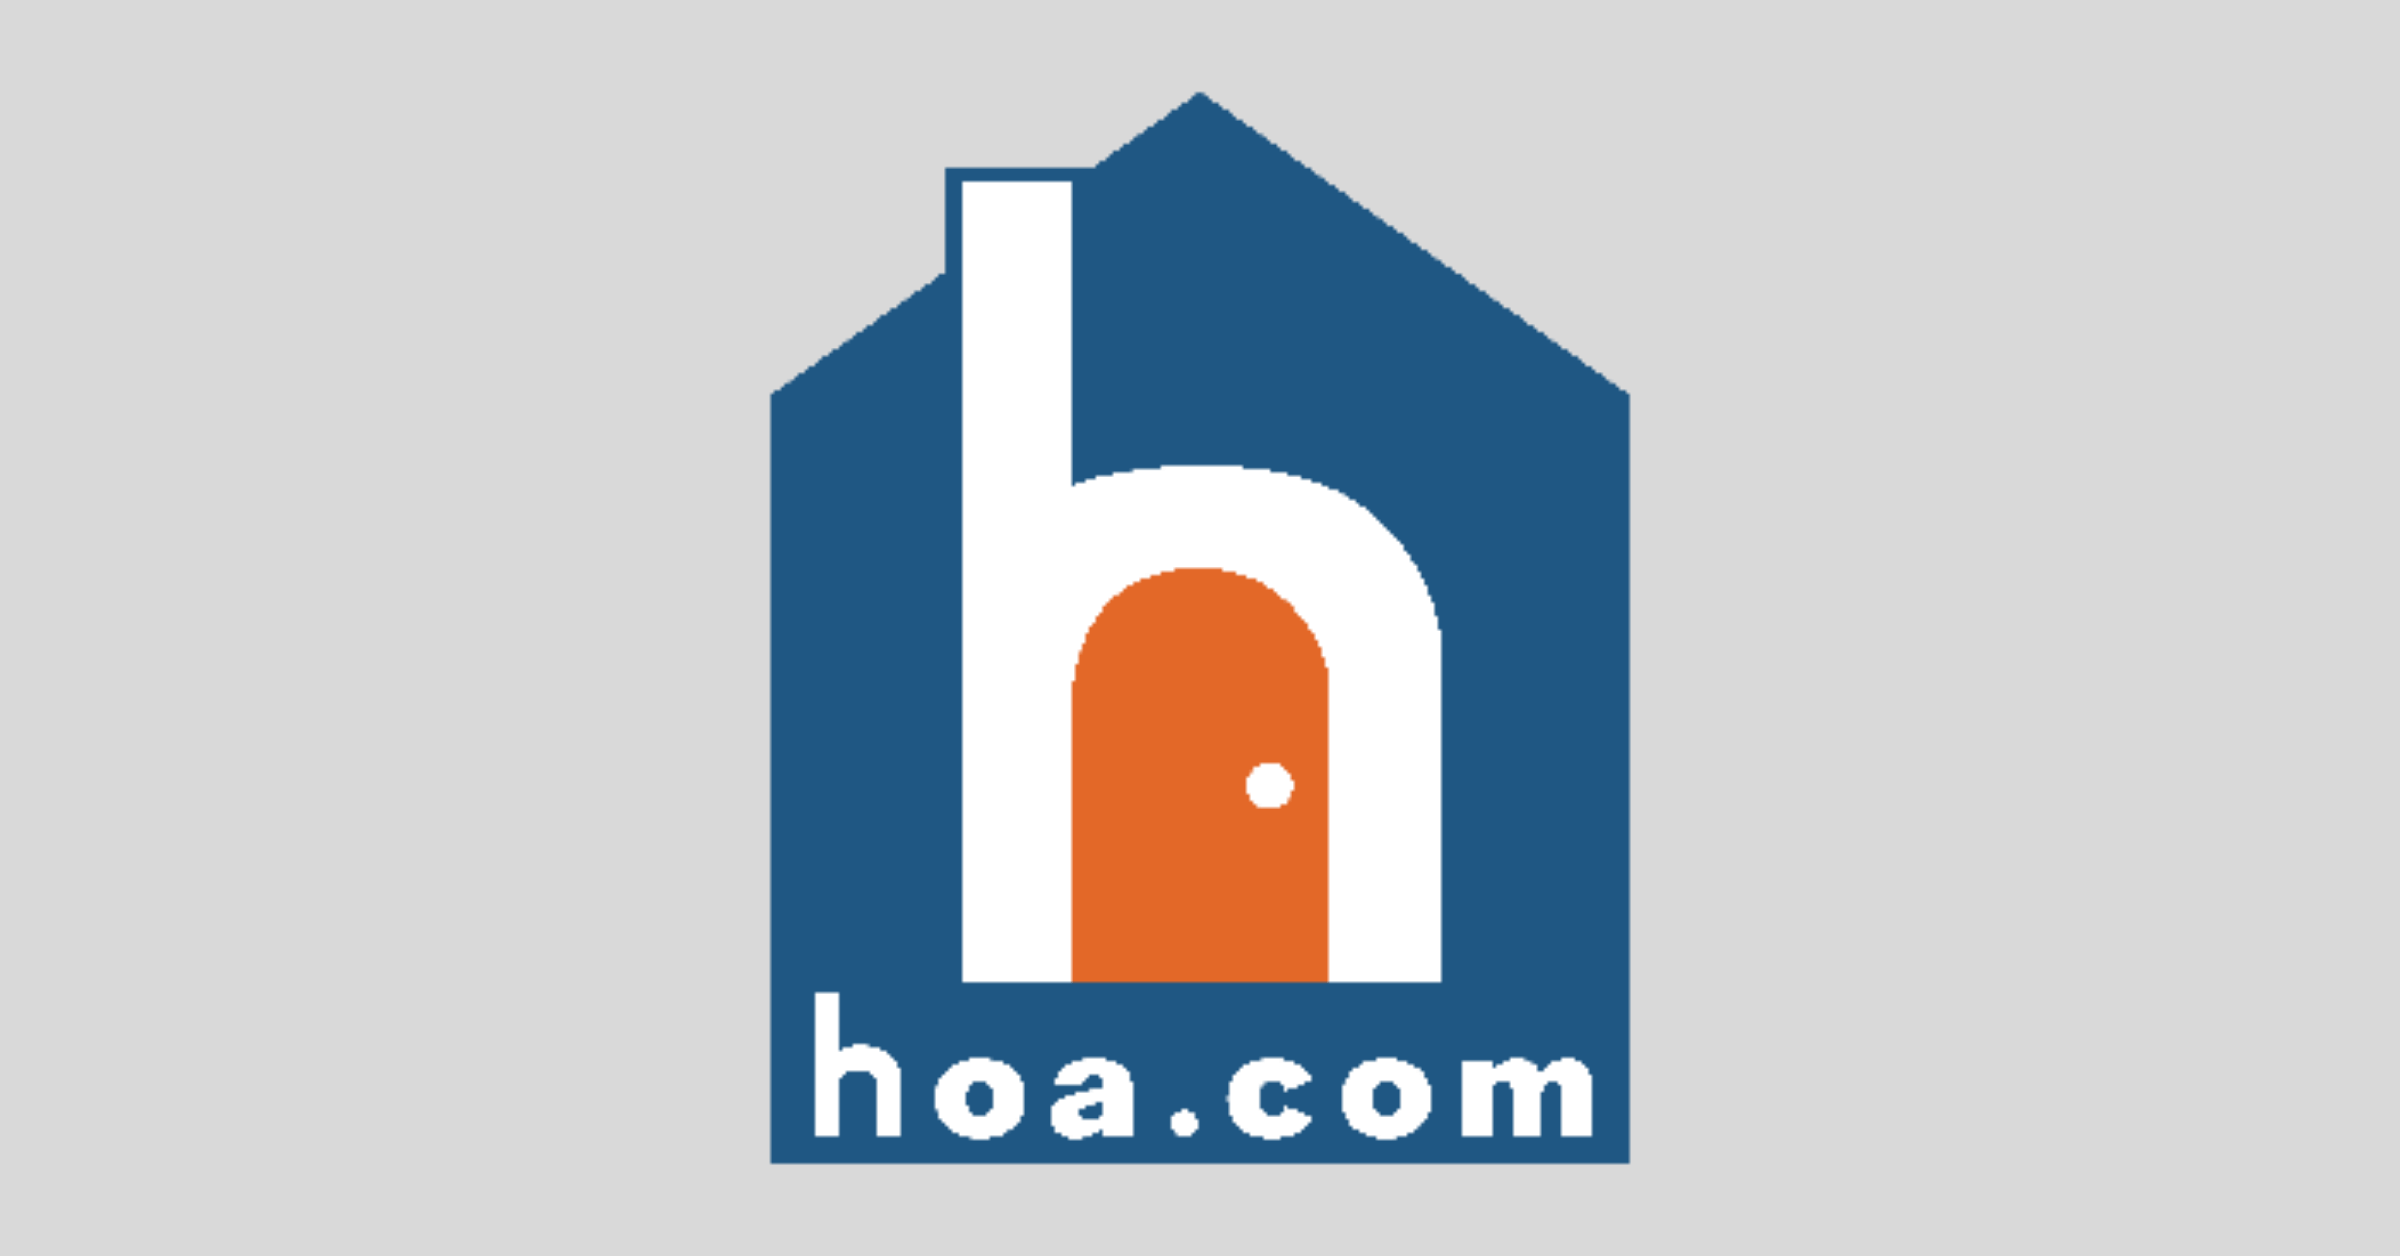 Black Dog Venture Partners CEO joins company board and executive team of HOA.com